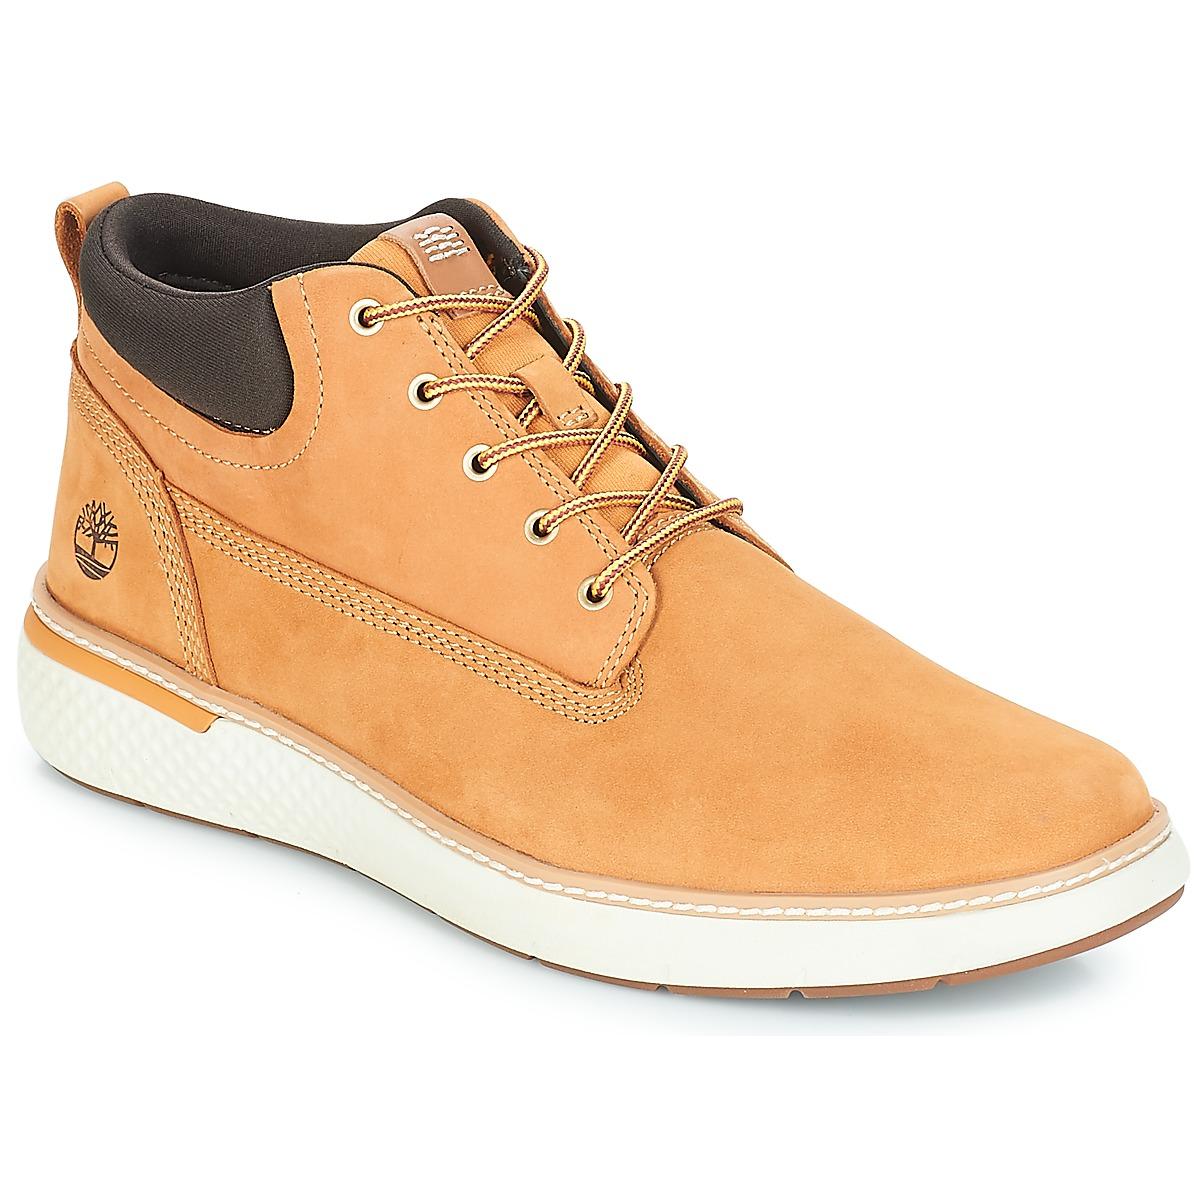 Sneakers Timberland  Cross Mark PT Chukka